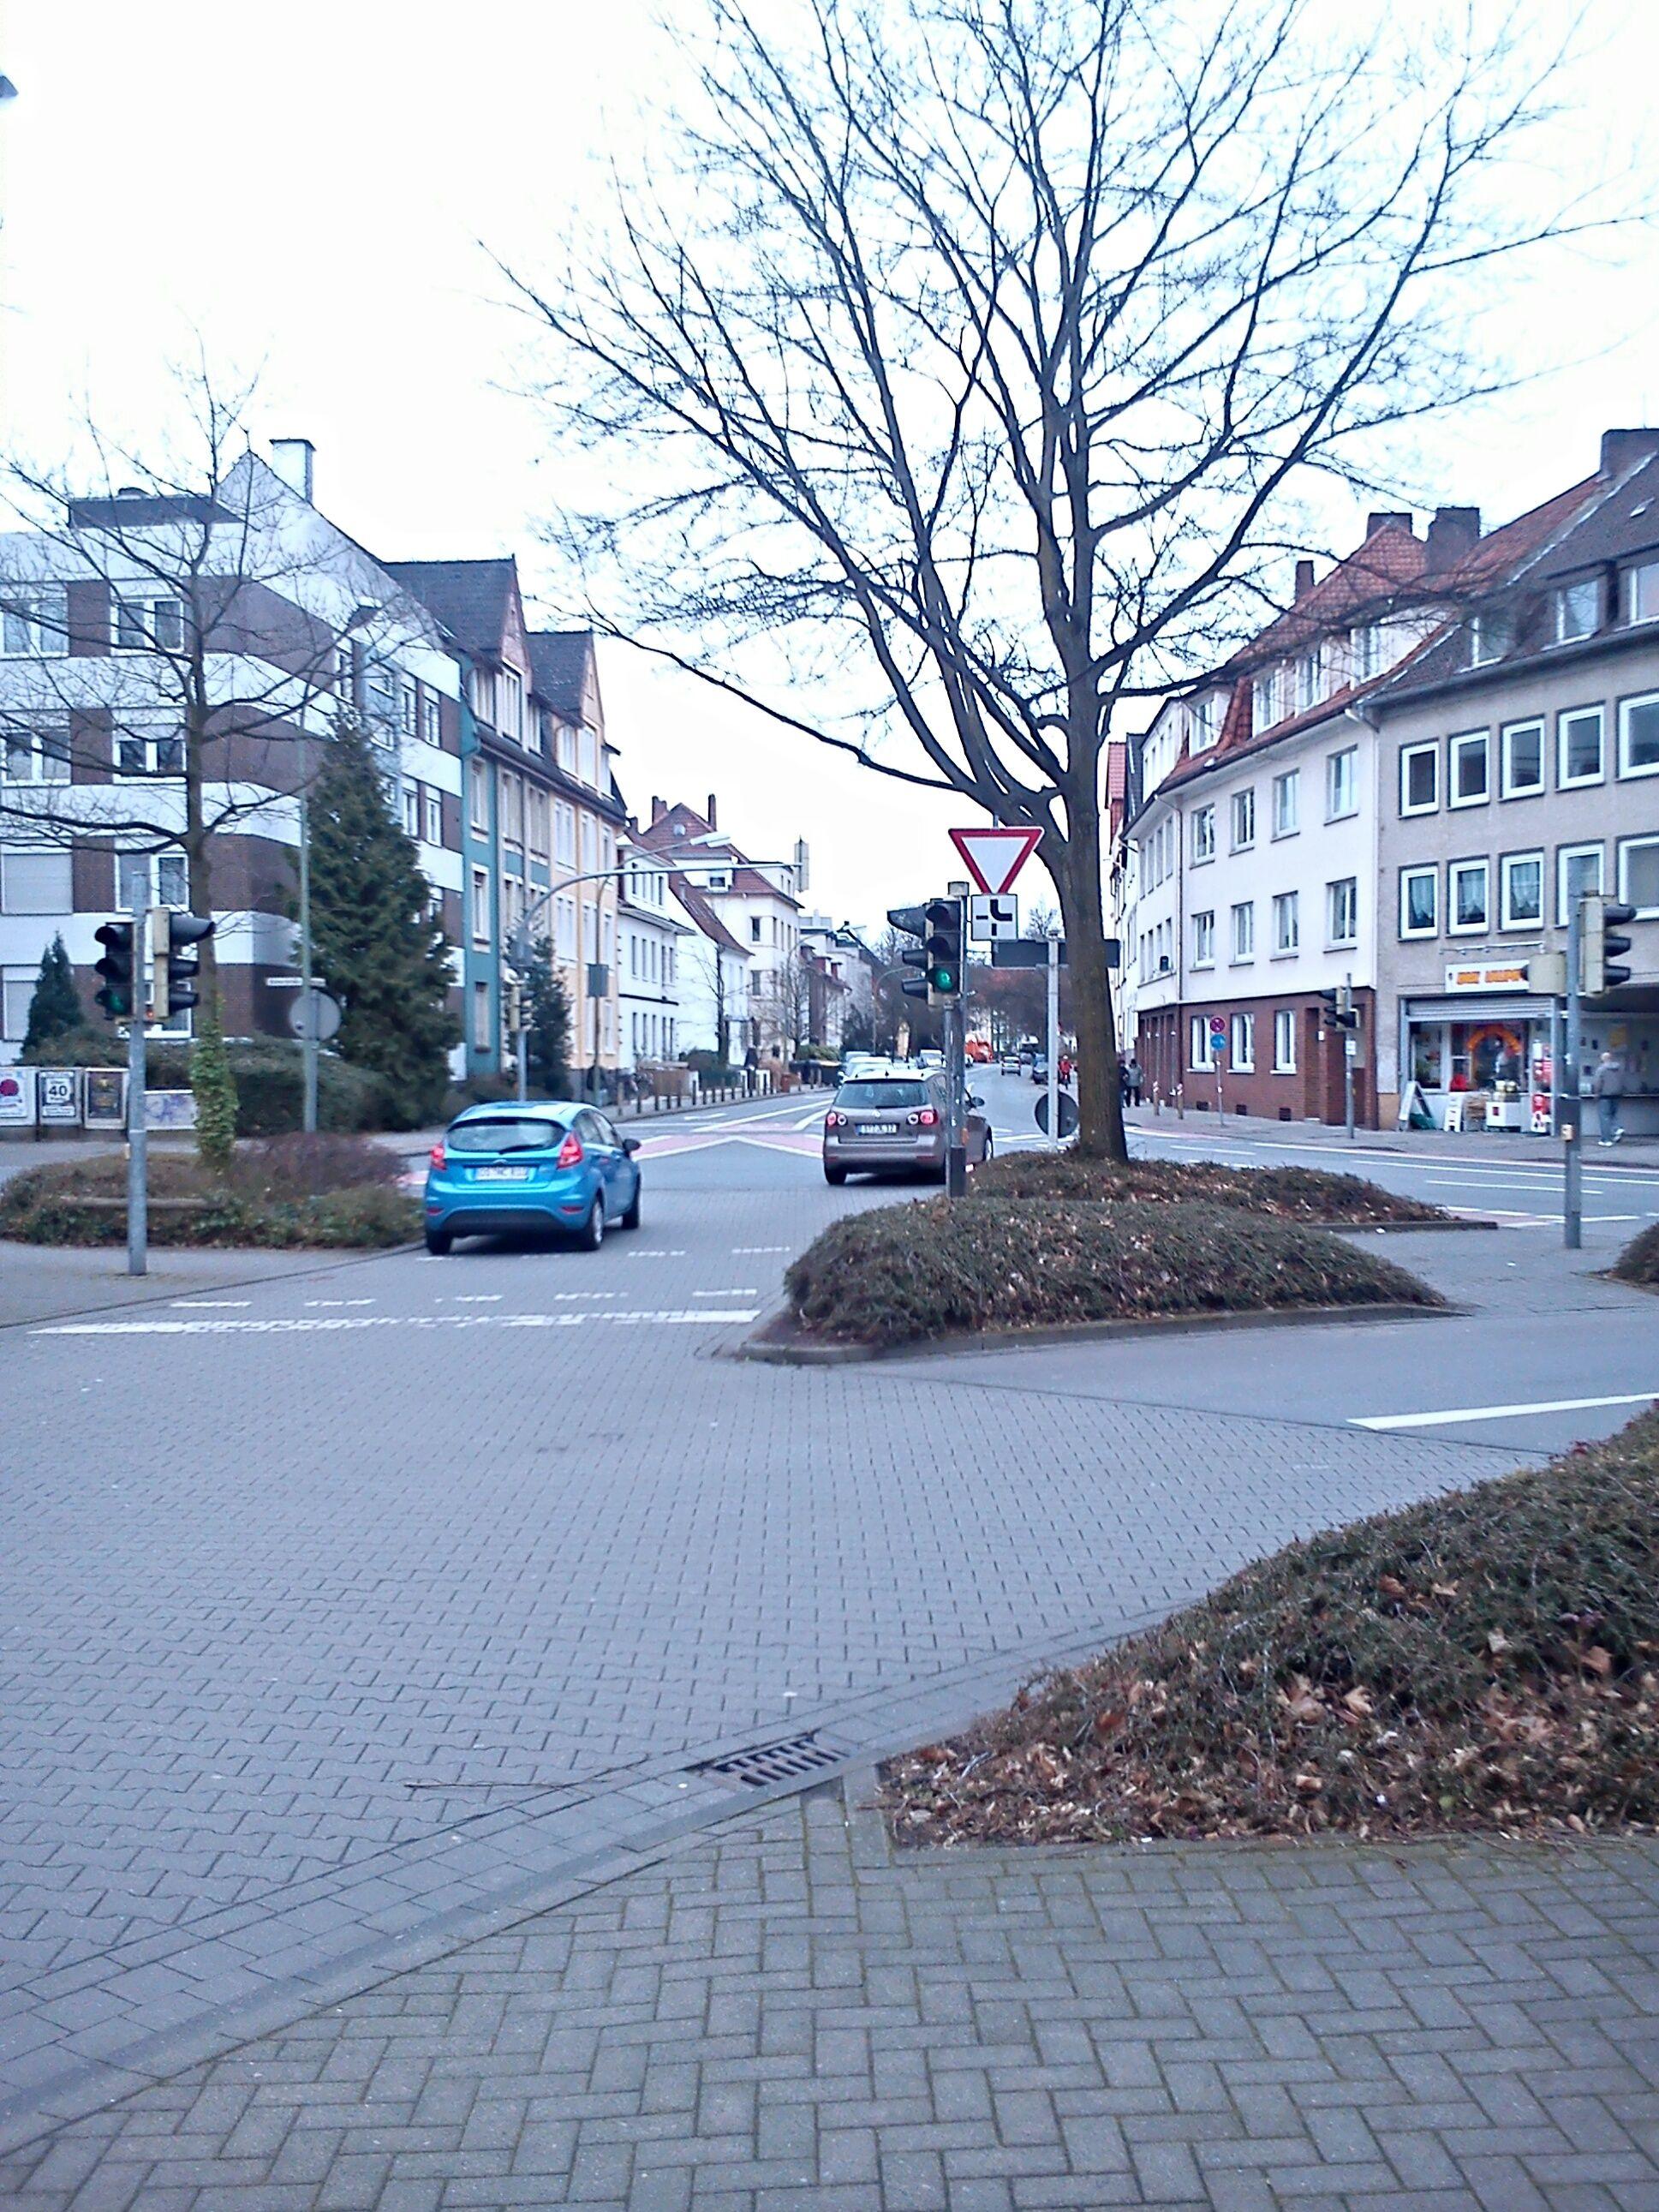 Saarplatz Os Osnabruck Germany Osnabruck Stadt Land